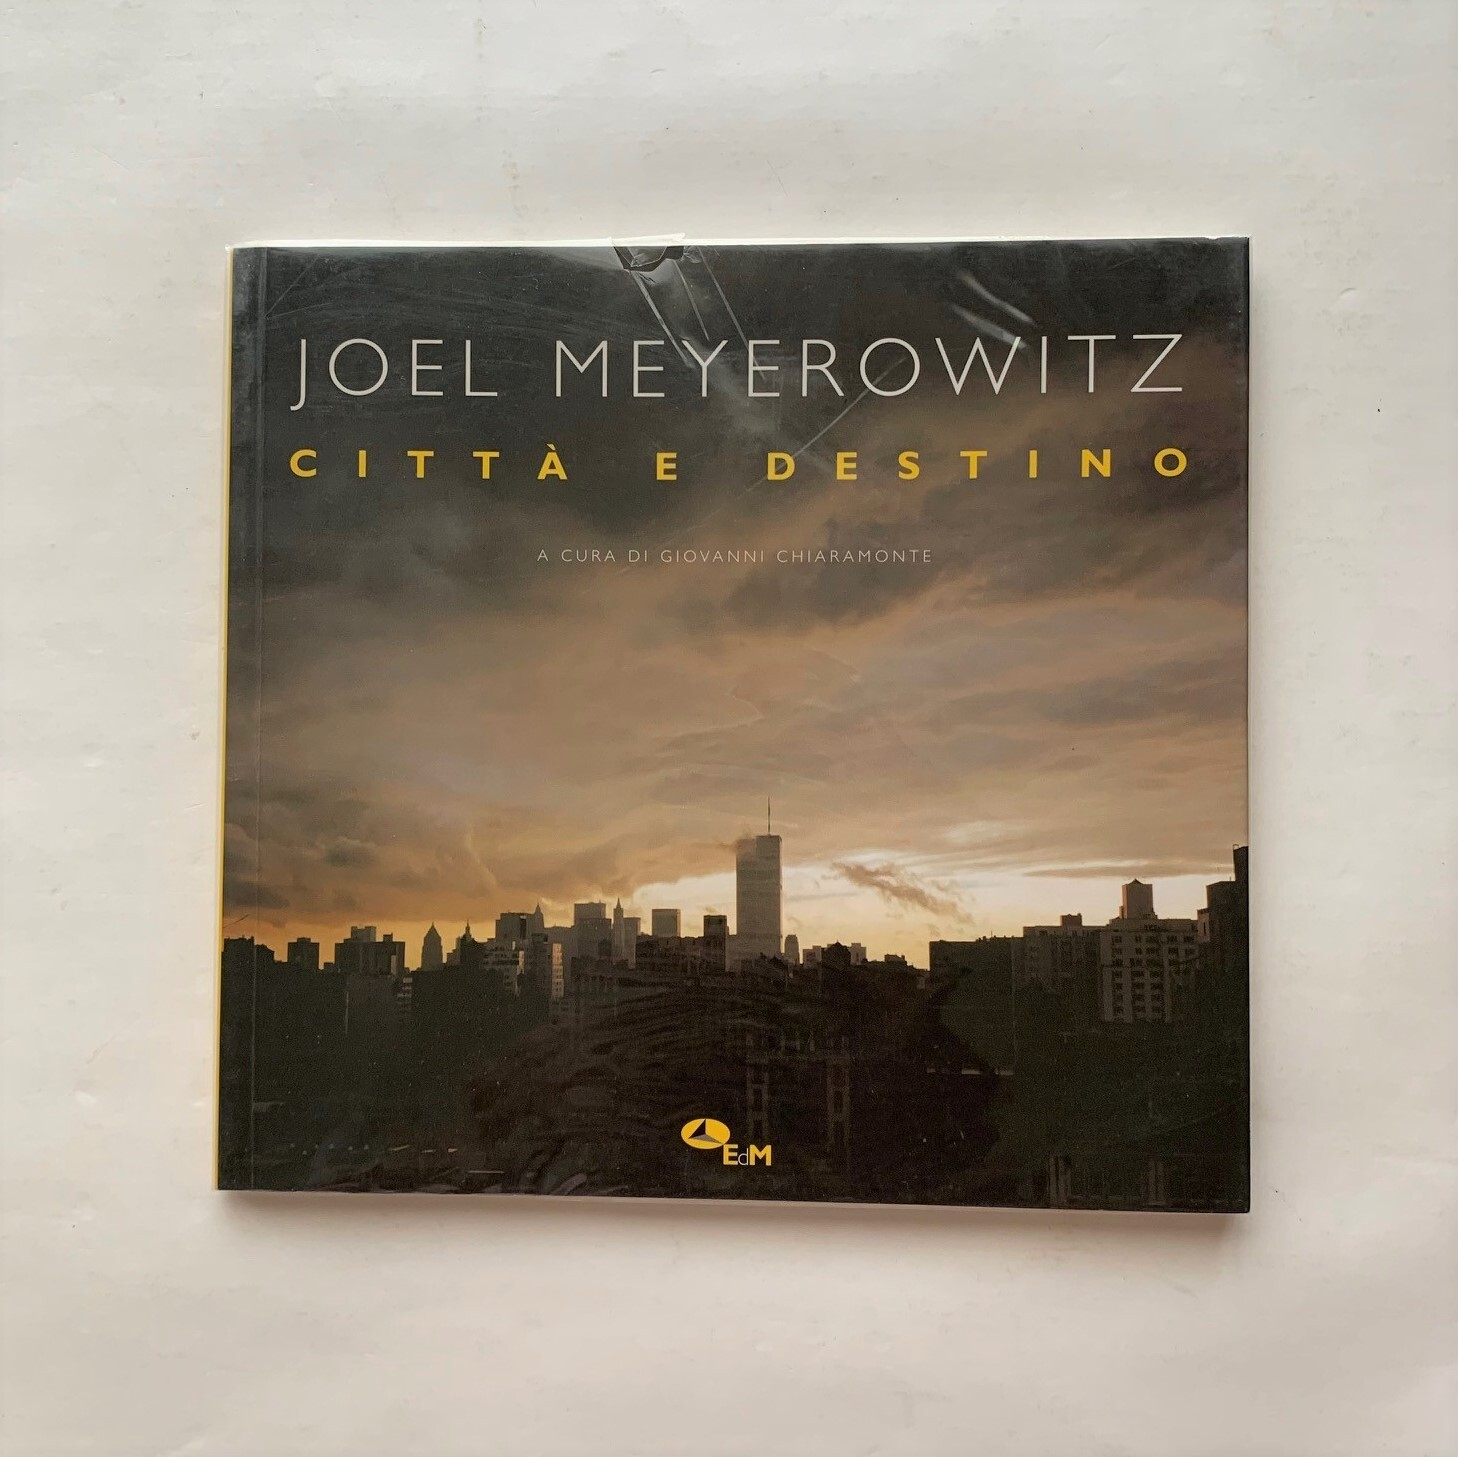 JOEL MEYEROWITZ  Città e destino /  ジョエル・マイヤーヴィッツ